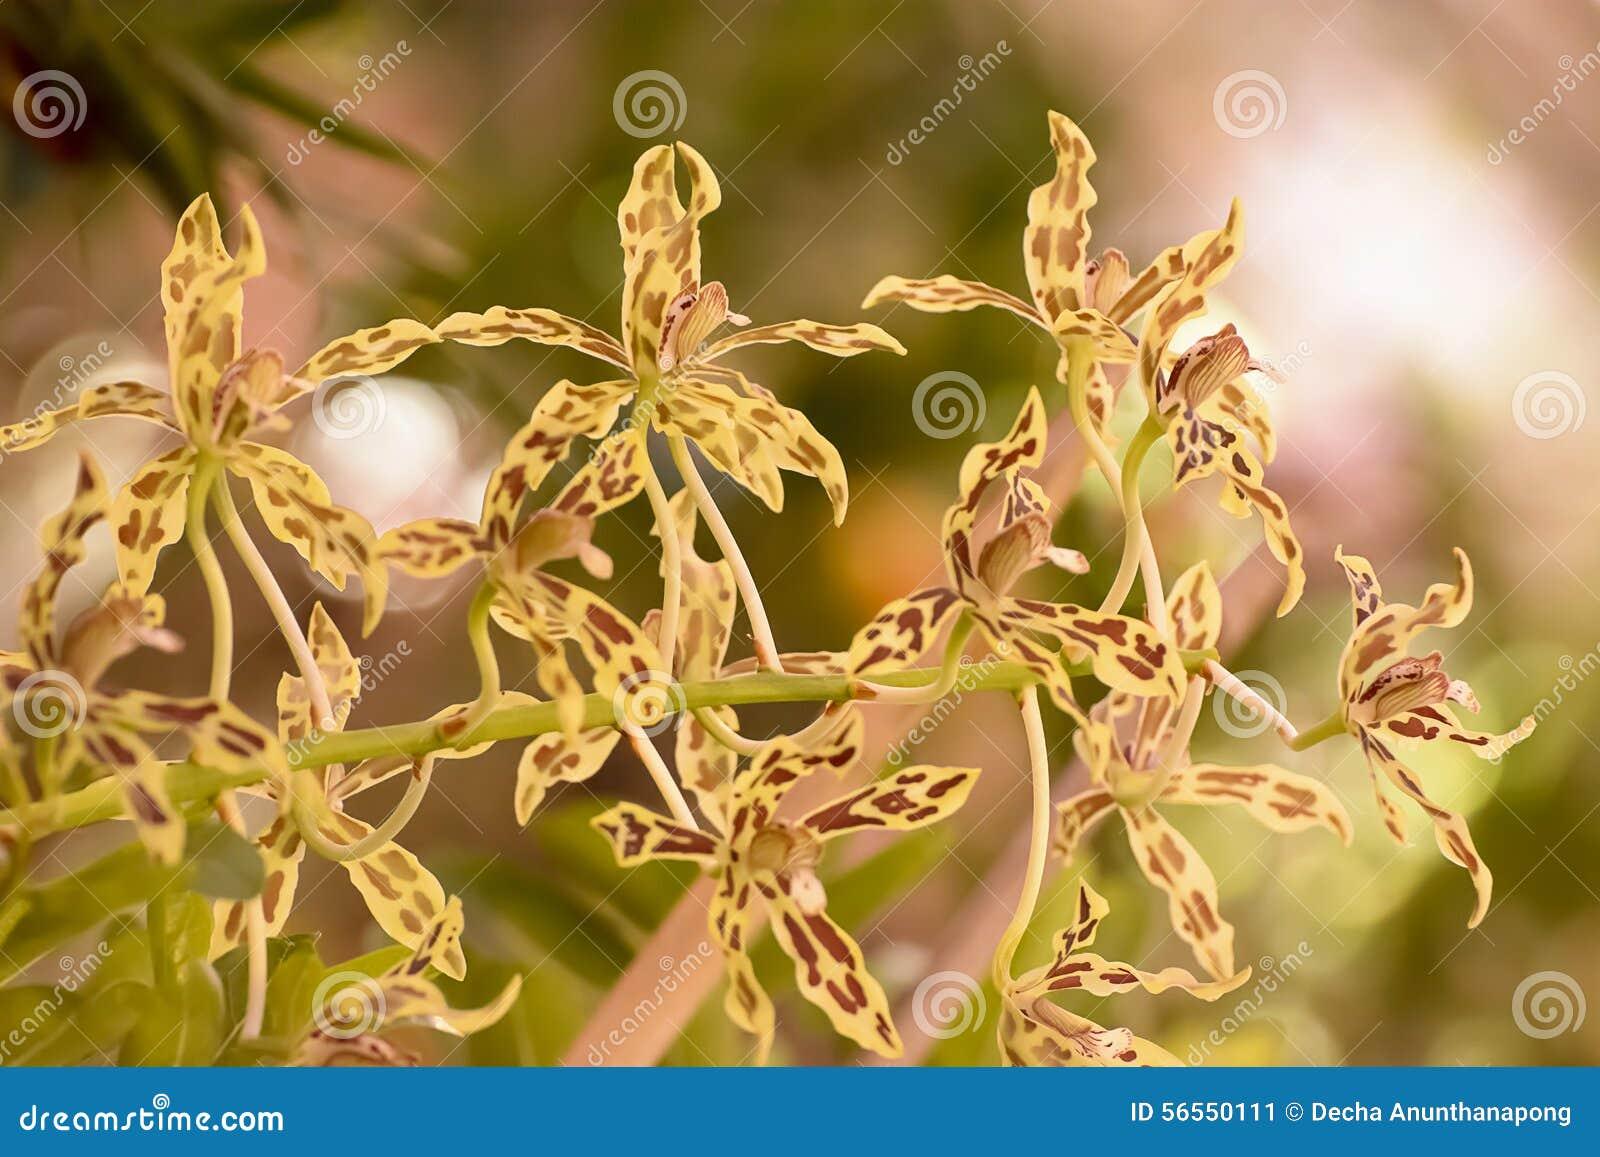 Download Ορχιδέα στοκ εικόνα. εικόνα από είναι, φυτά, αυτό, ανεμοδαρμένη - 56550111